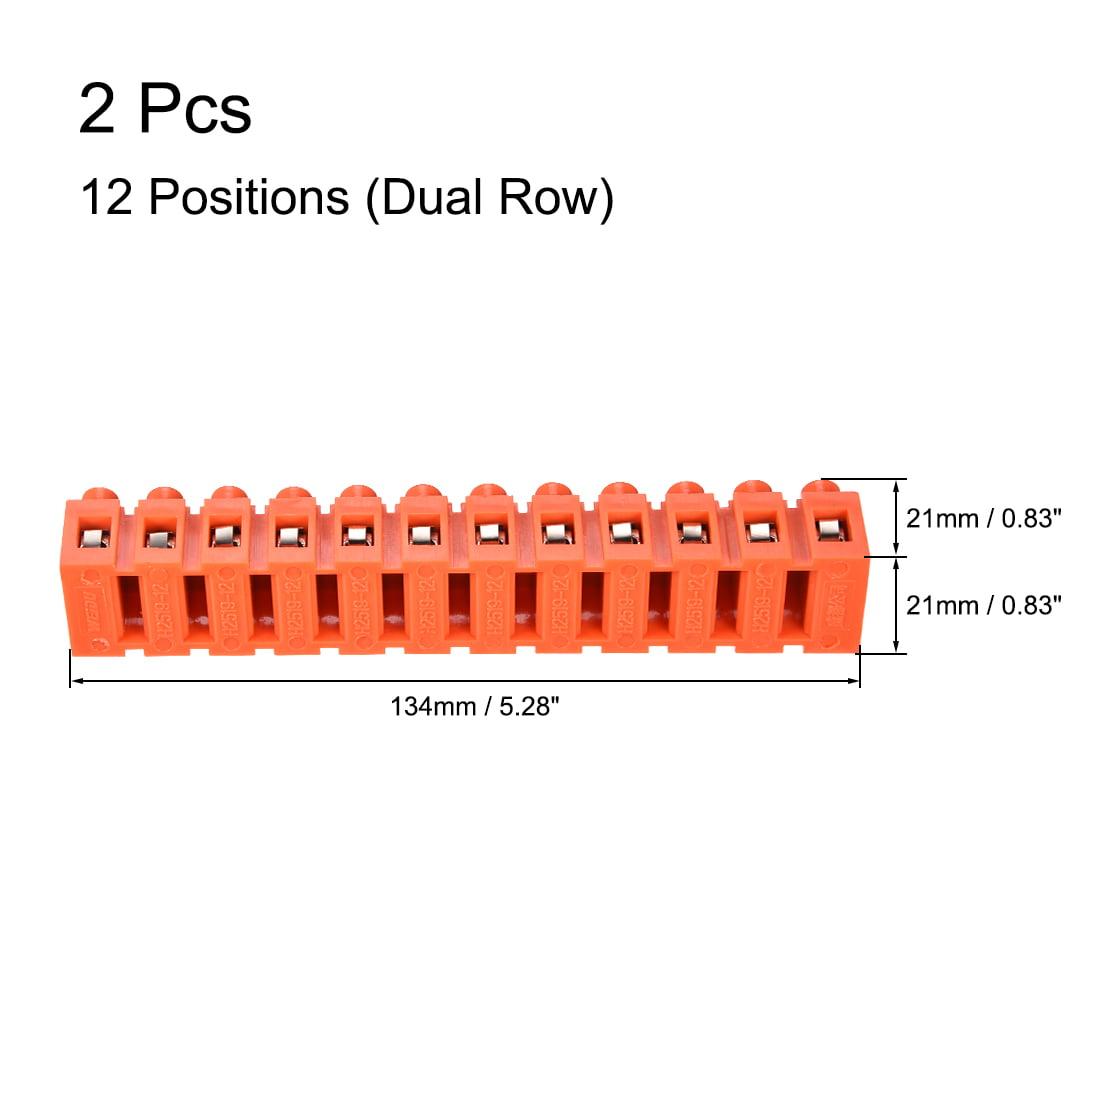 Terminal Block, 600V 36A Dual Row 12 Positions Screw Terminal 2 Pcs - image 1 de 3